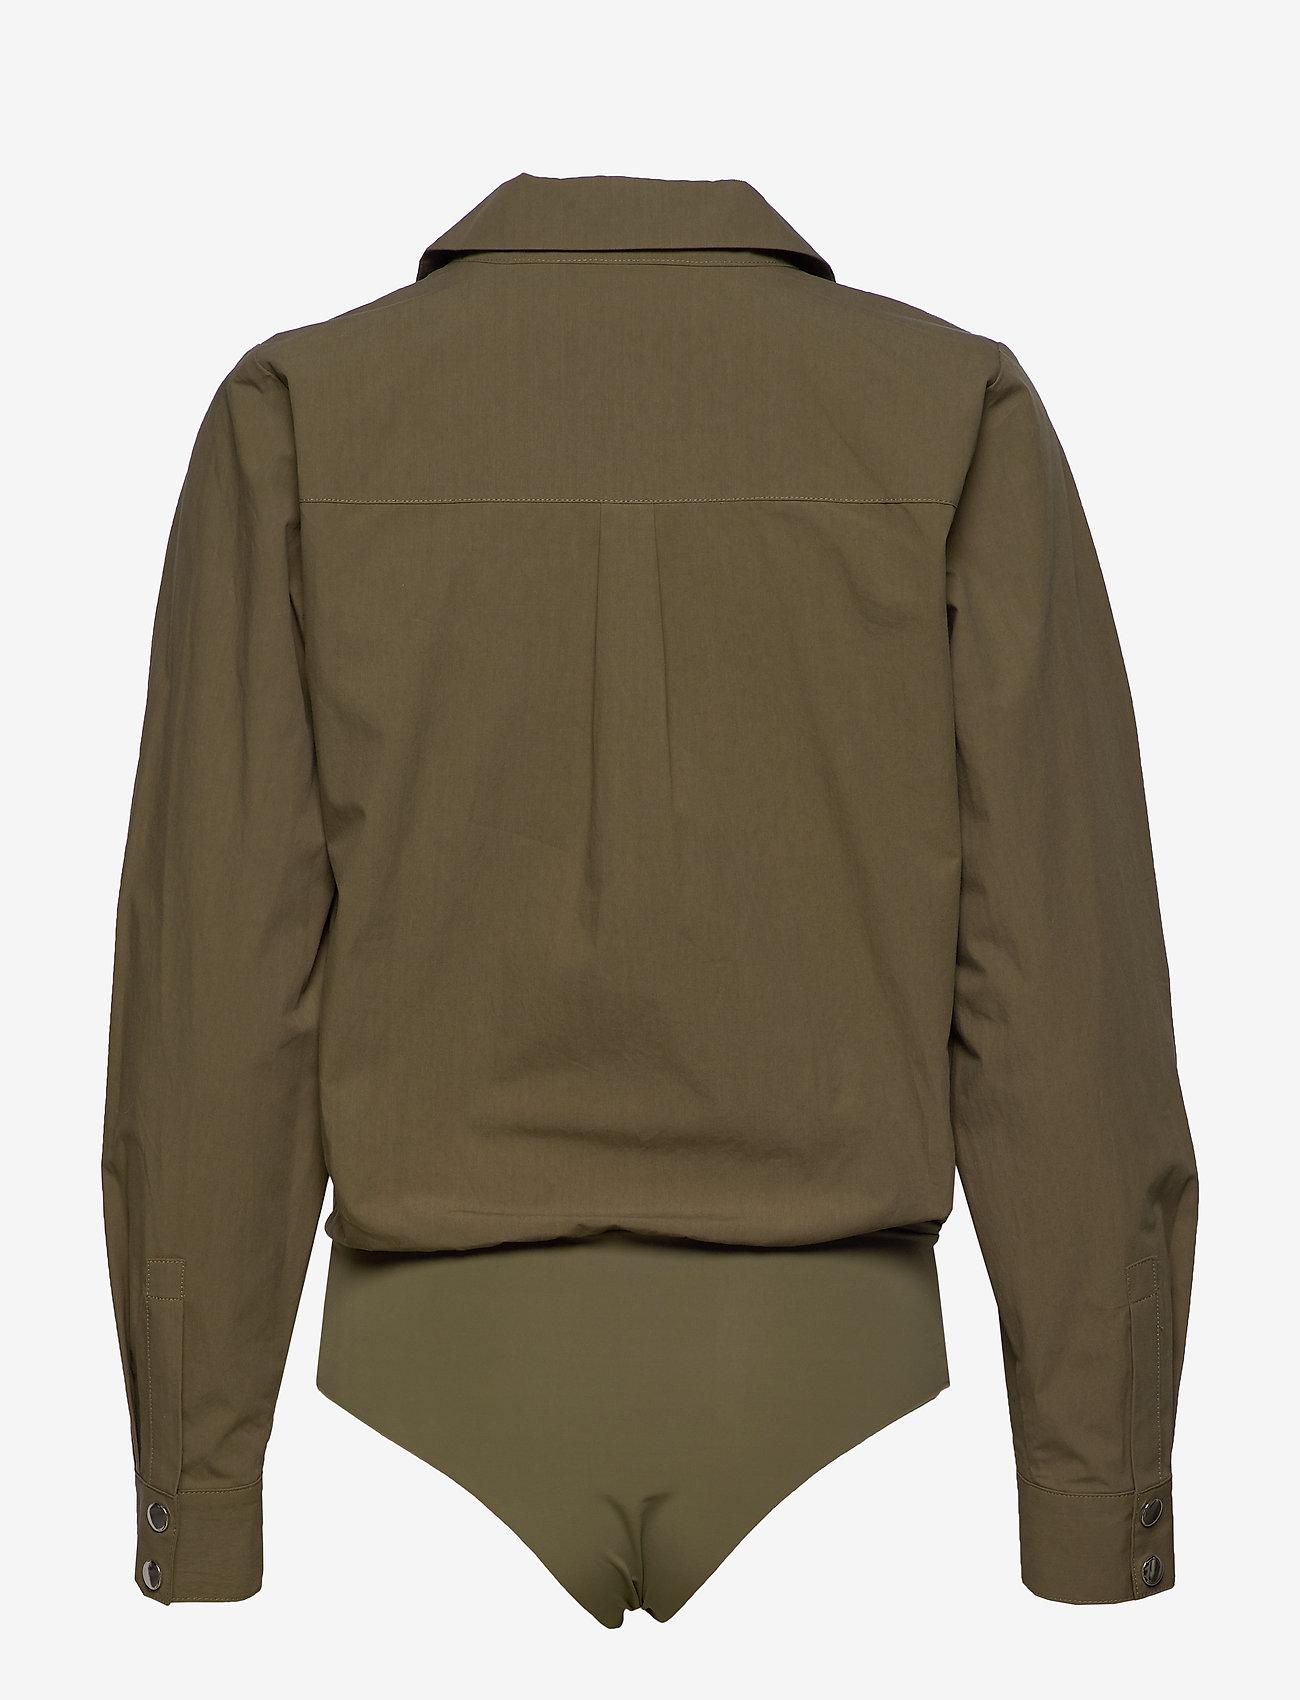 Gestuz - AdalineGZ shirt body MS20 - body - capers - 1